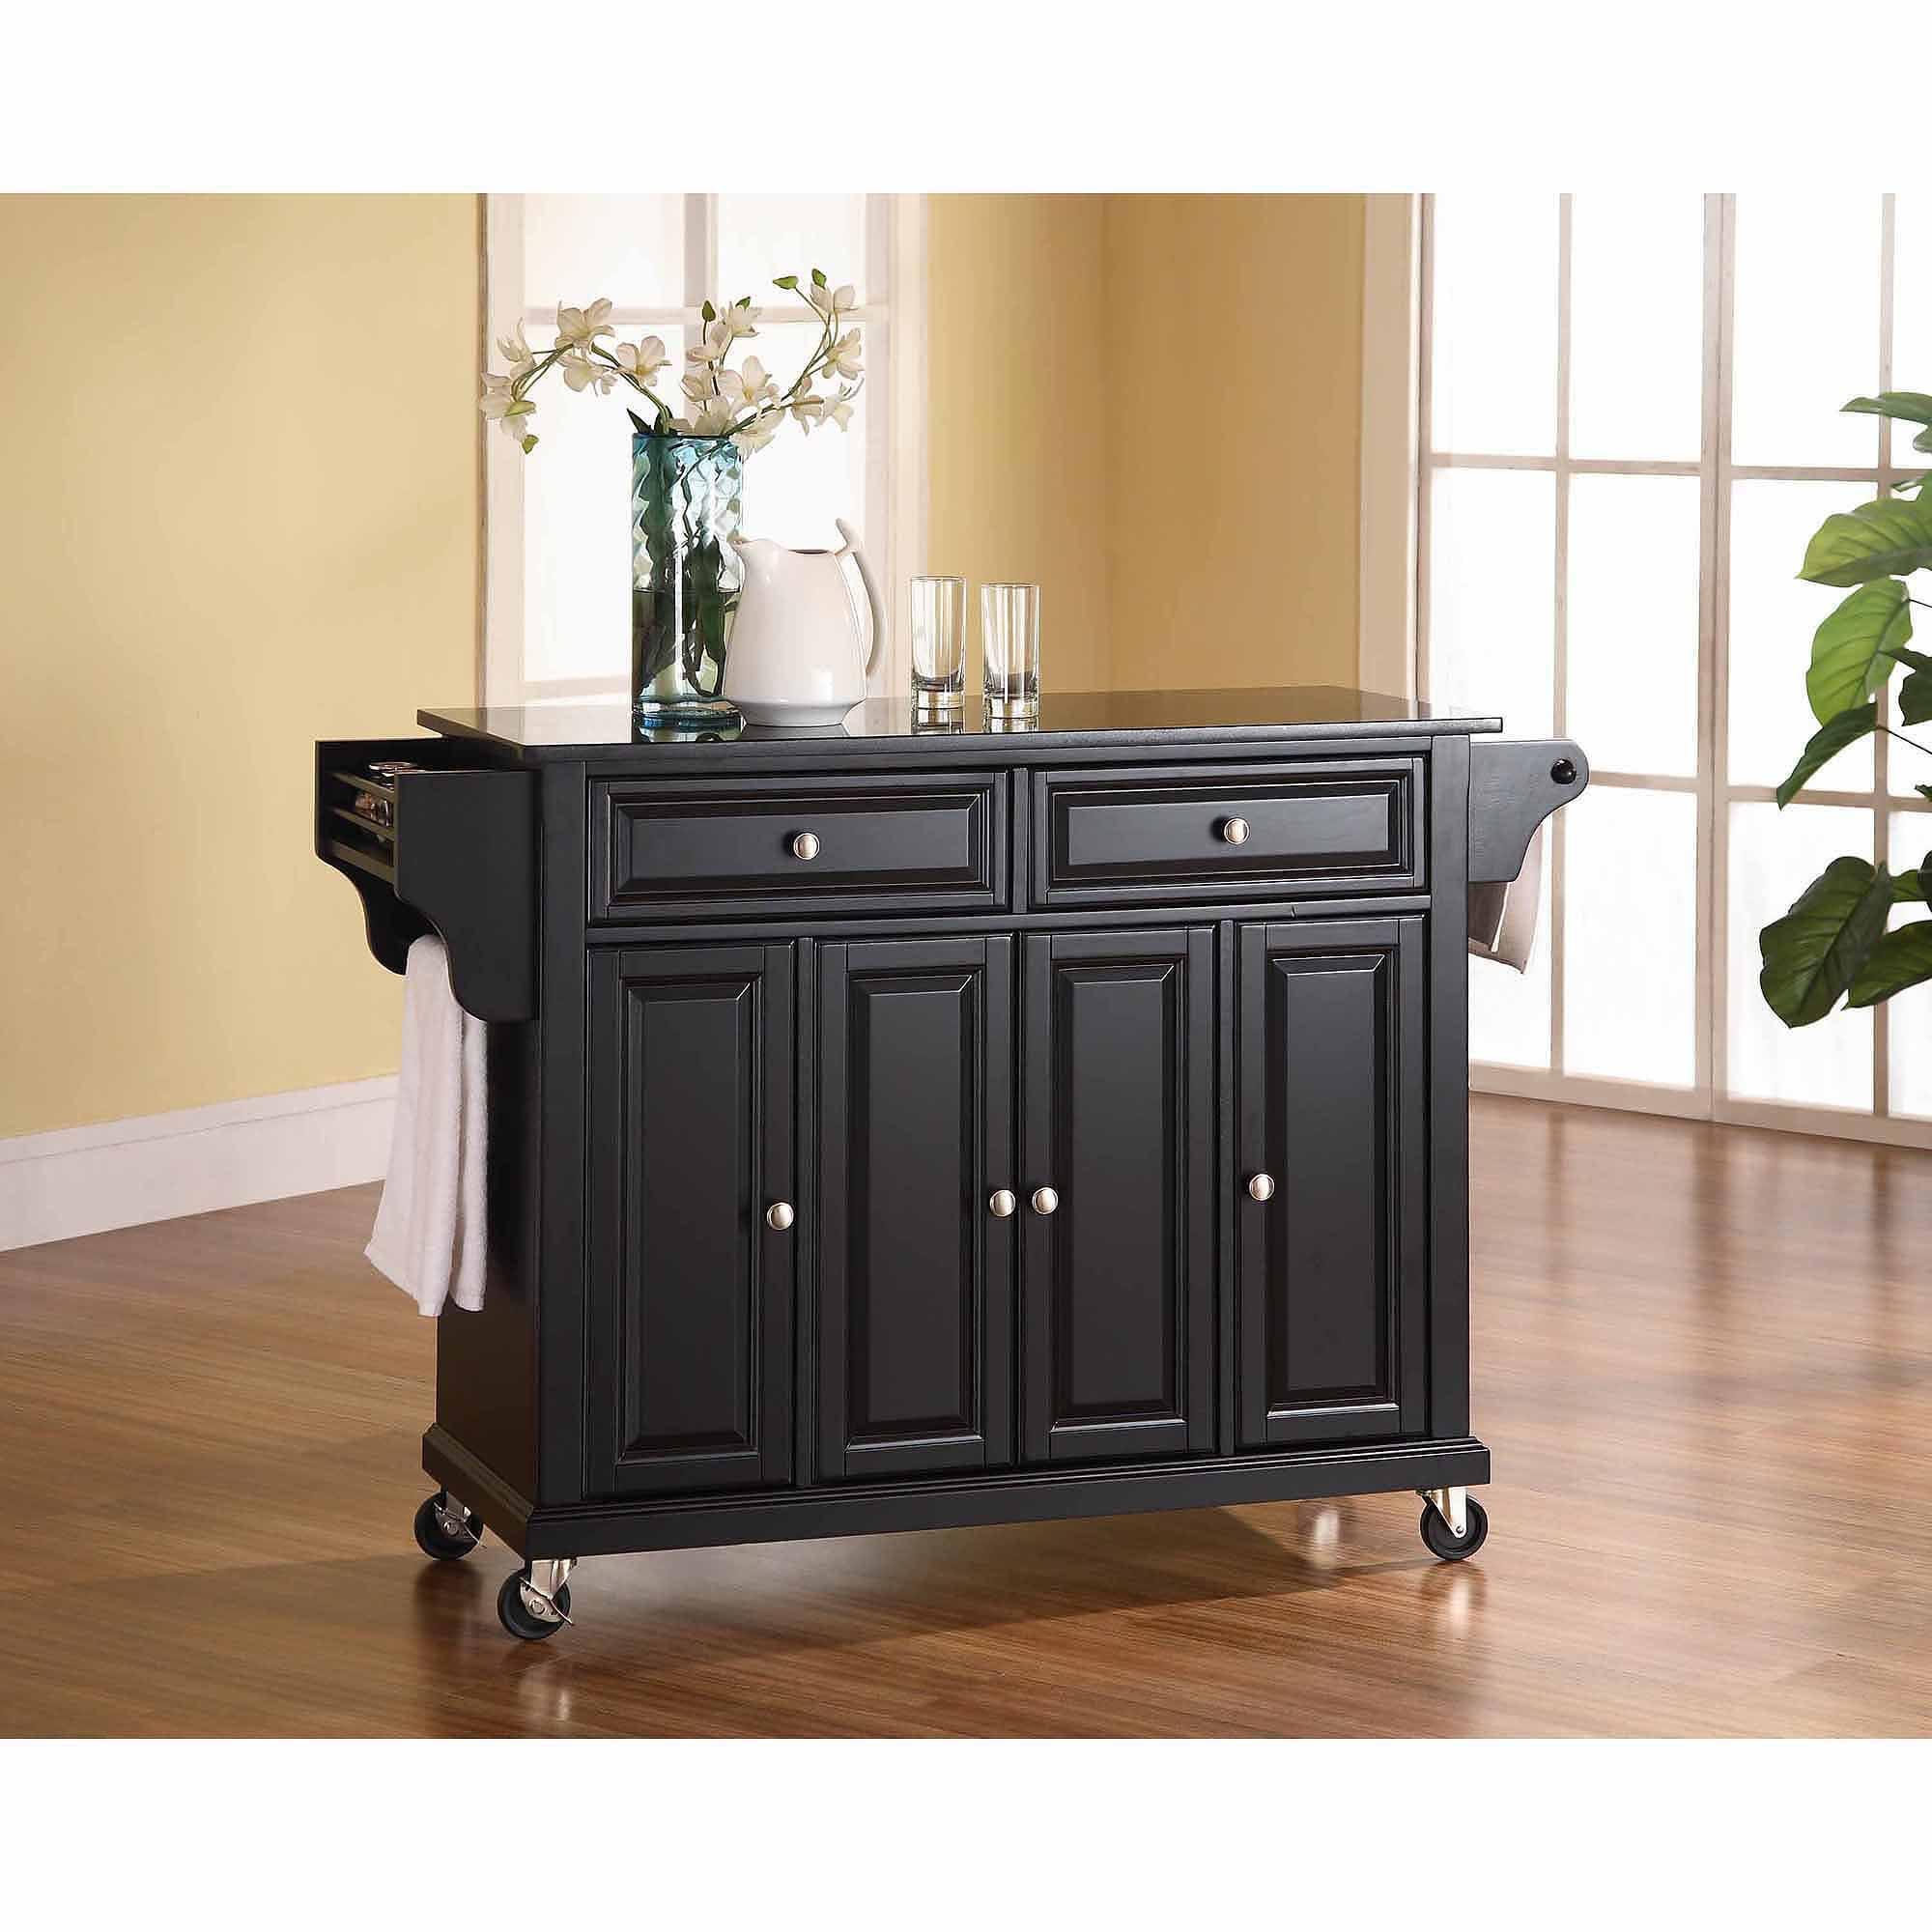 Crosley Kitchen Cart With Granite Top Crosley Furniture Solid Black Granite Top Kitchen Cart Walmartcom